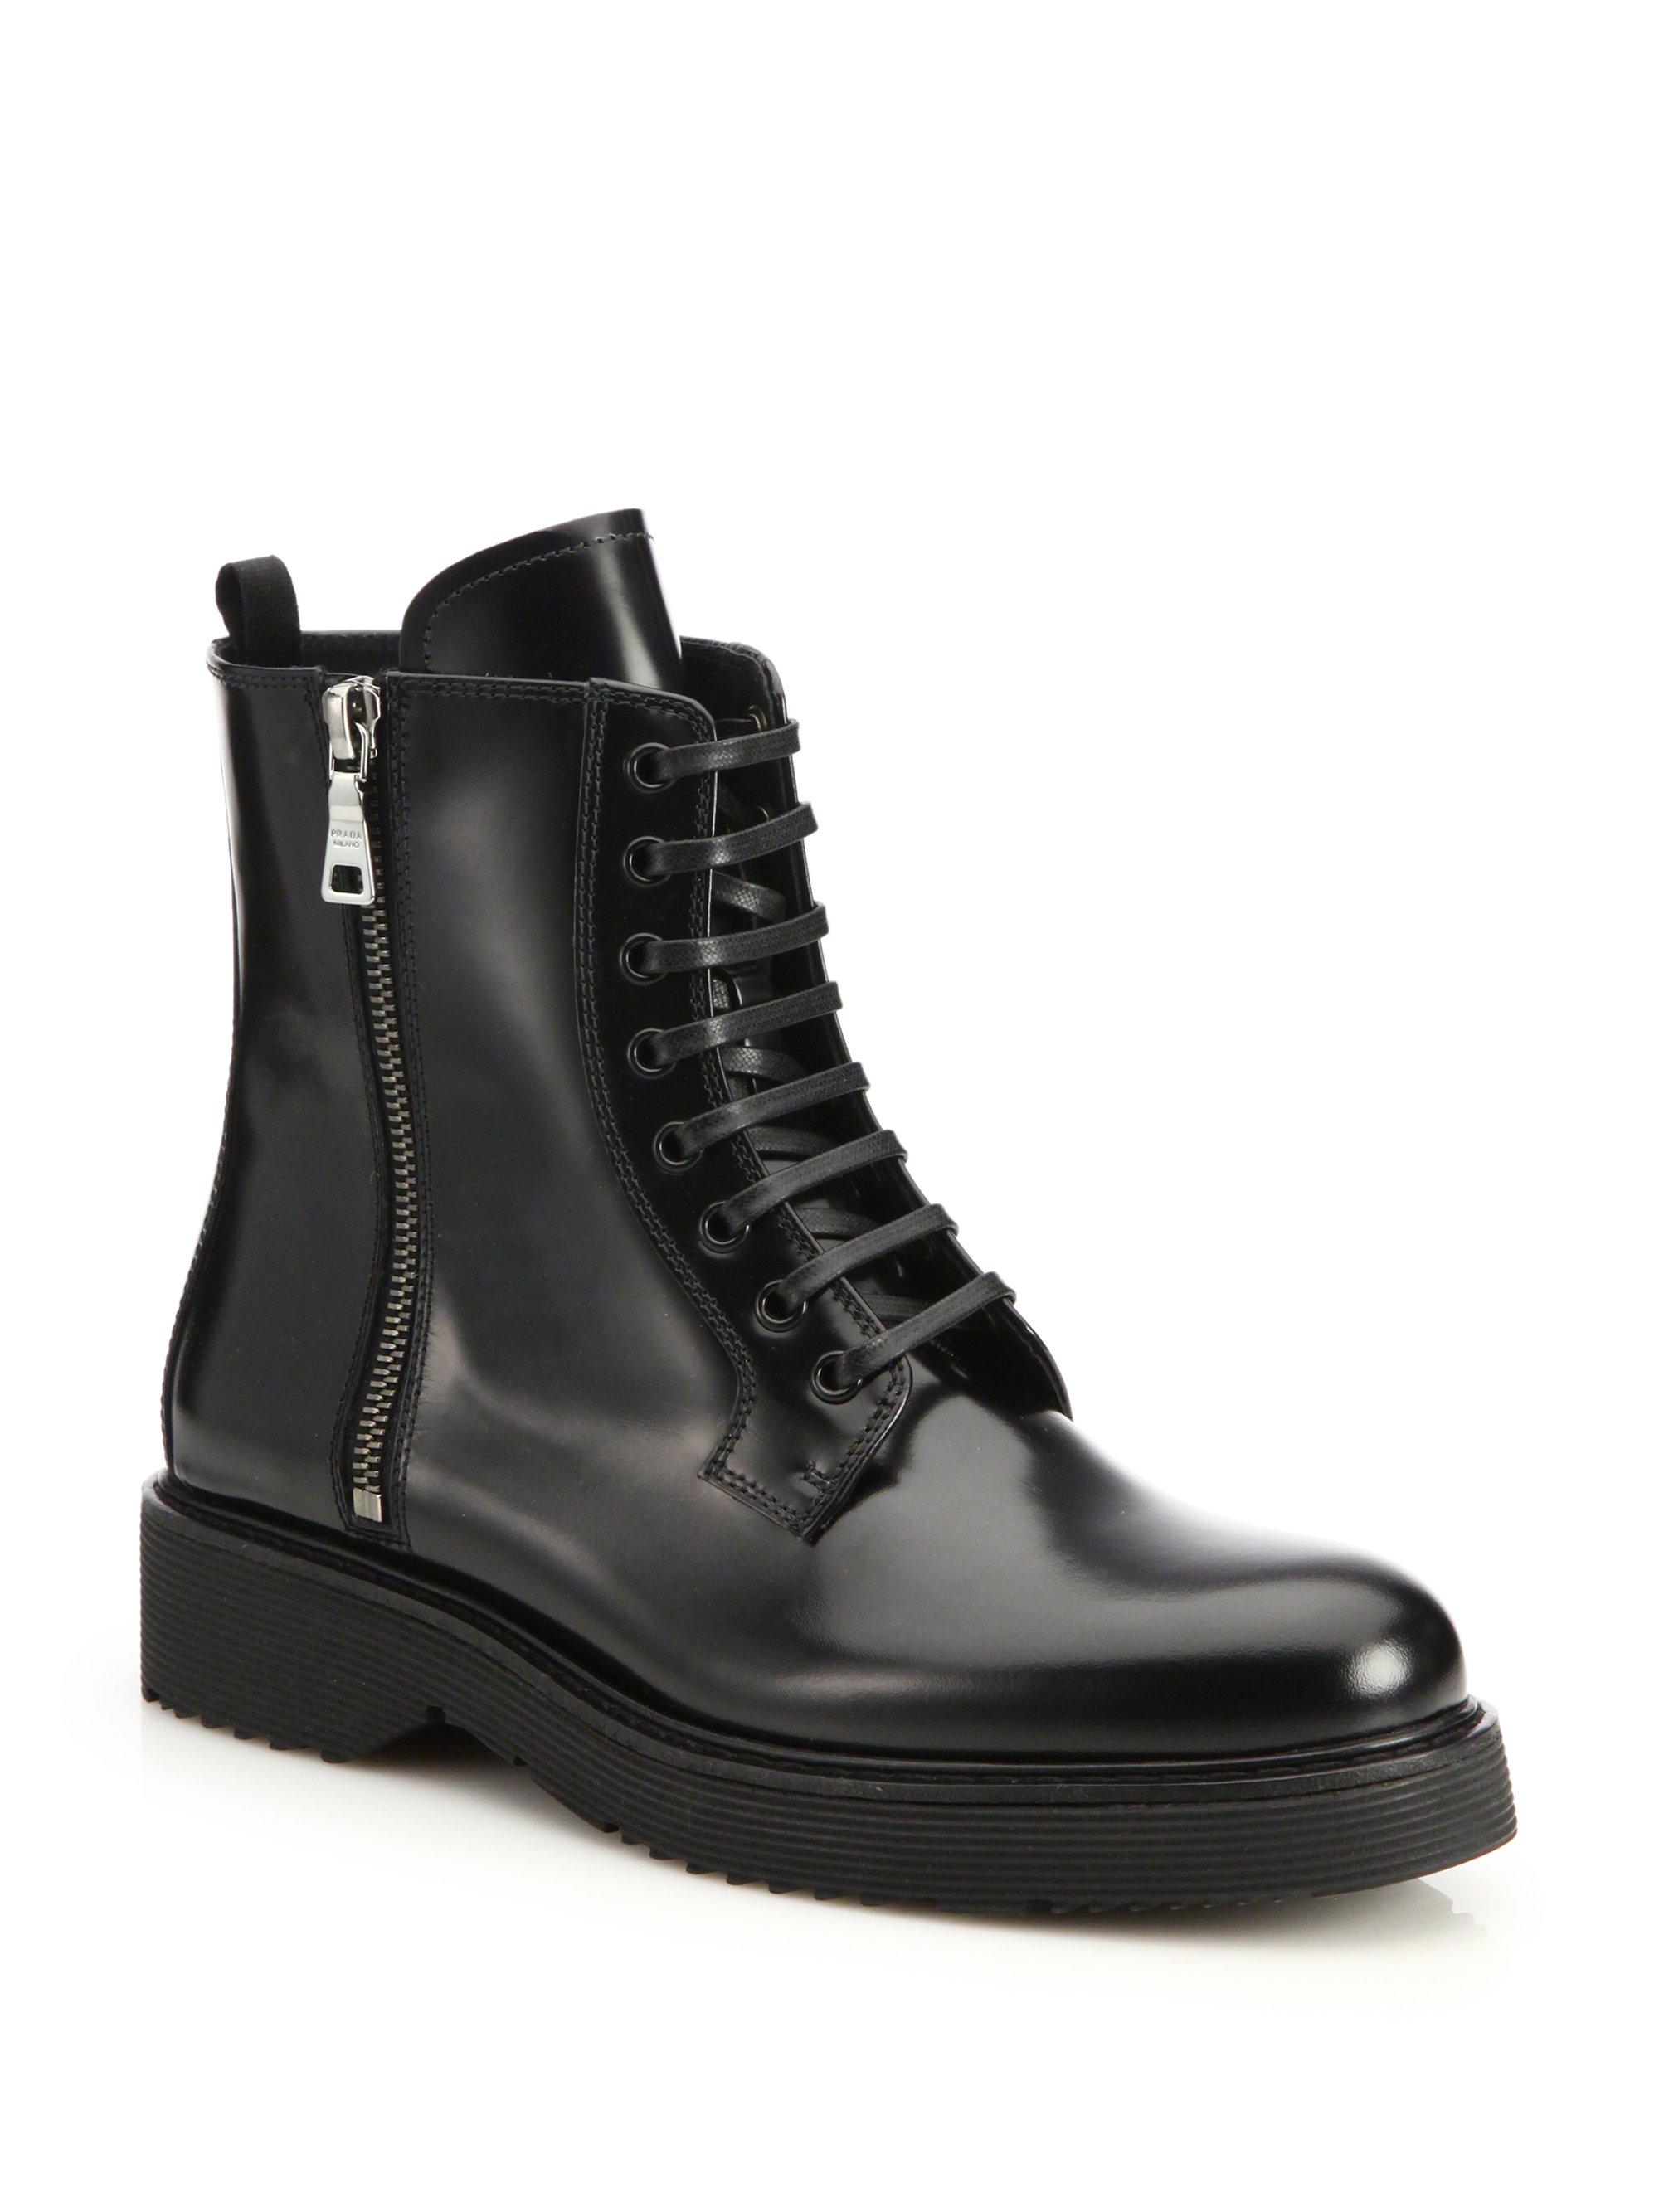 Lyst - Prada Spazzolato Combat Boots in Black 0a1a53a7afd4